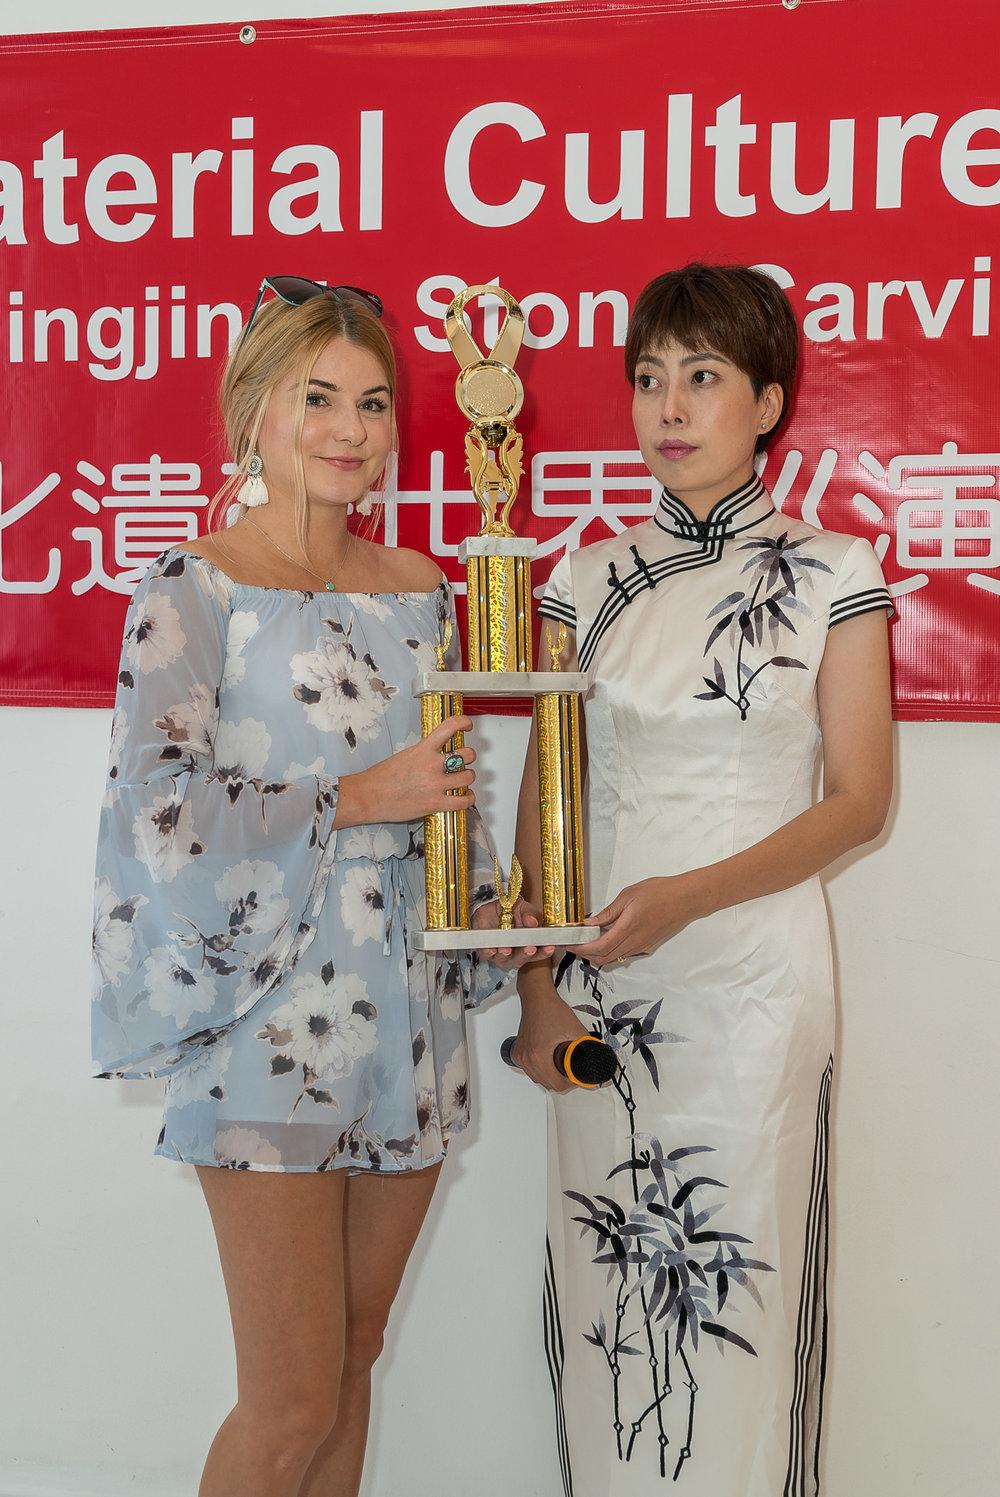 Deedee Benkovich and Yang Jingjing